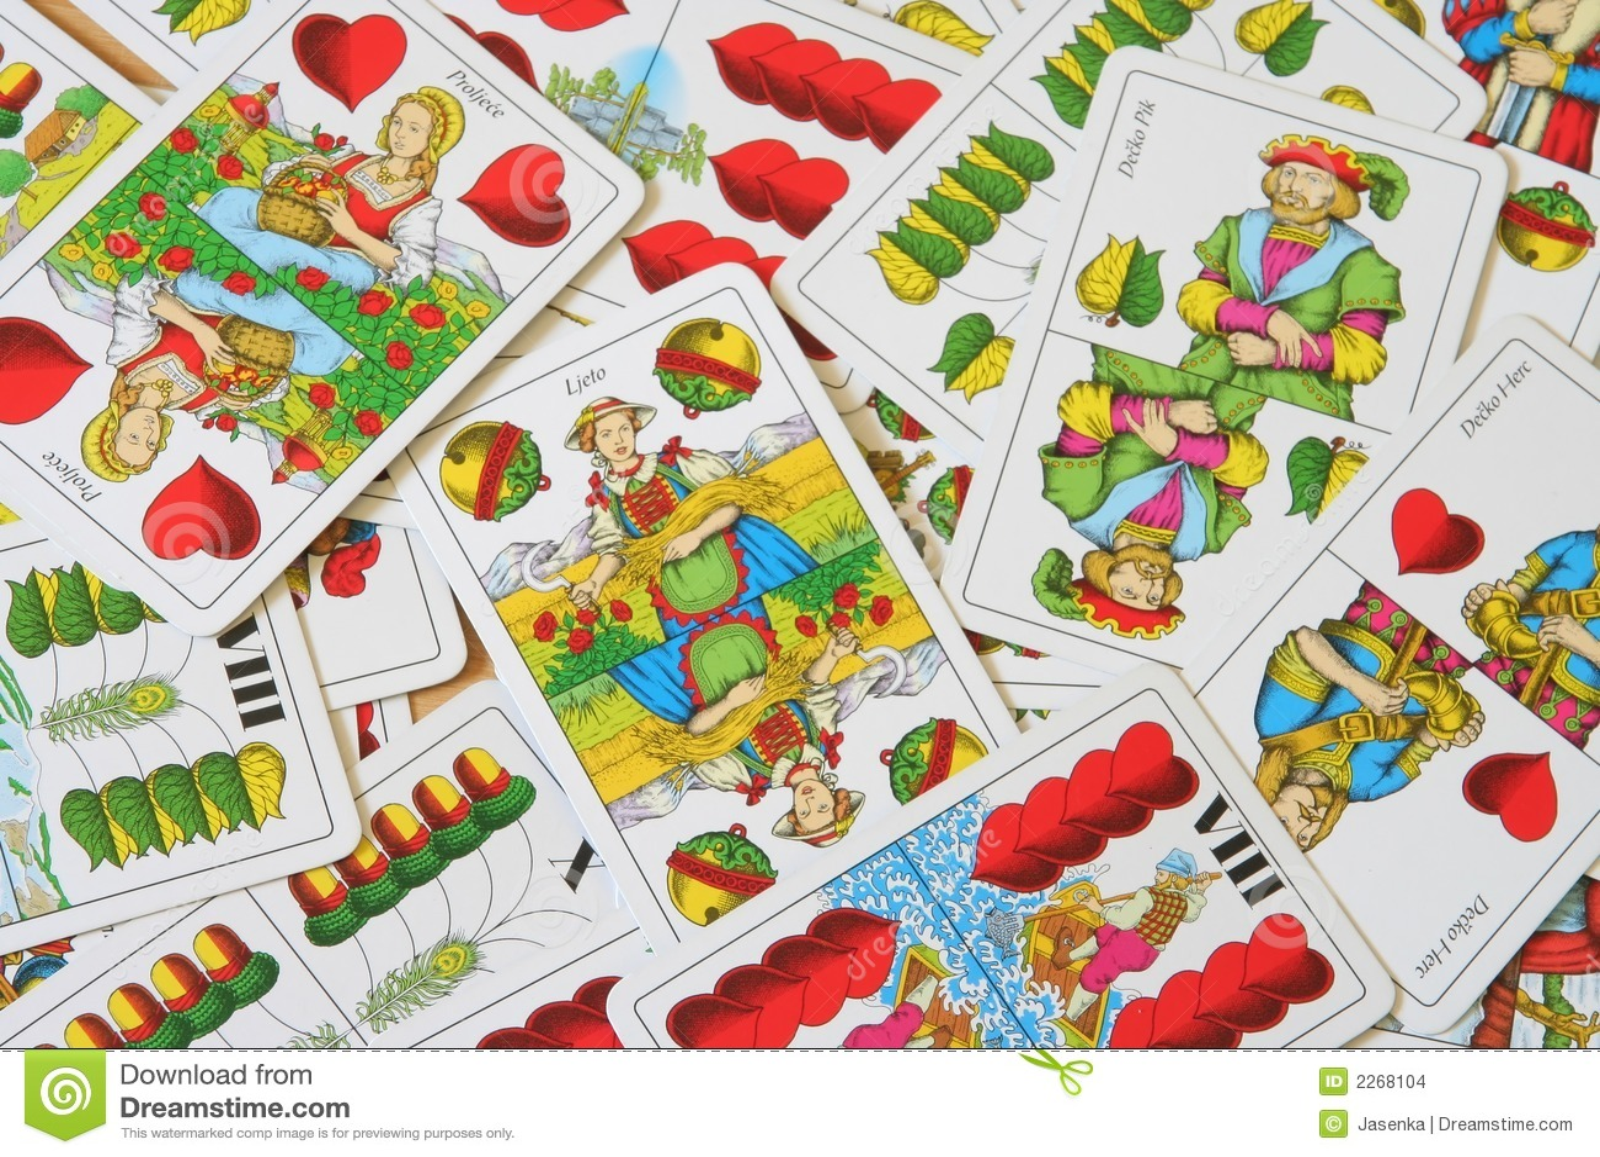 igre karte bela